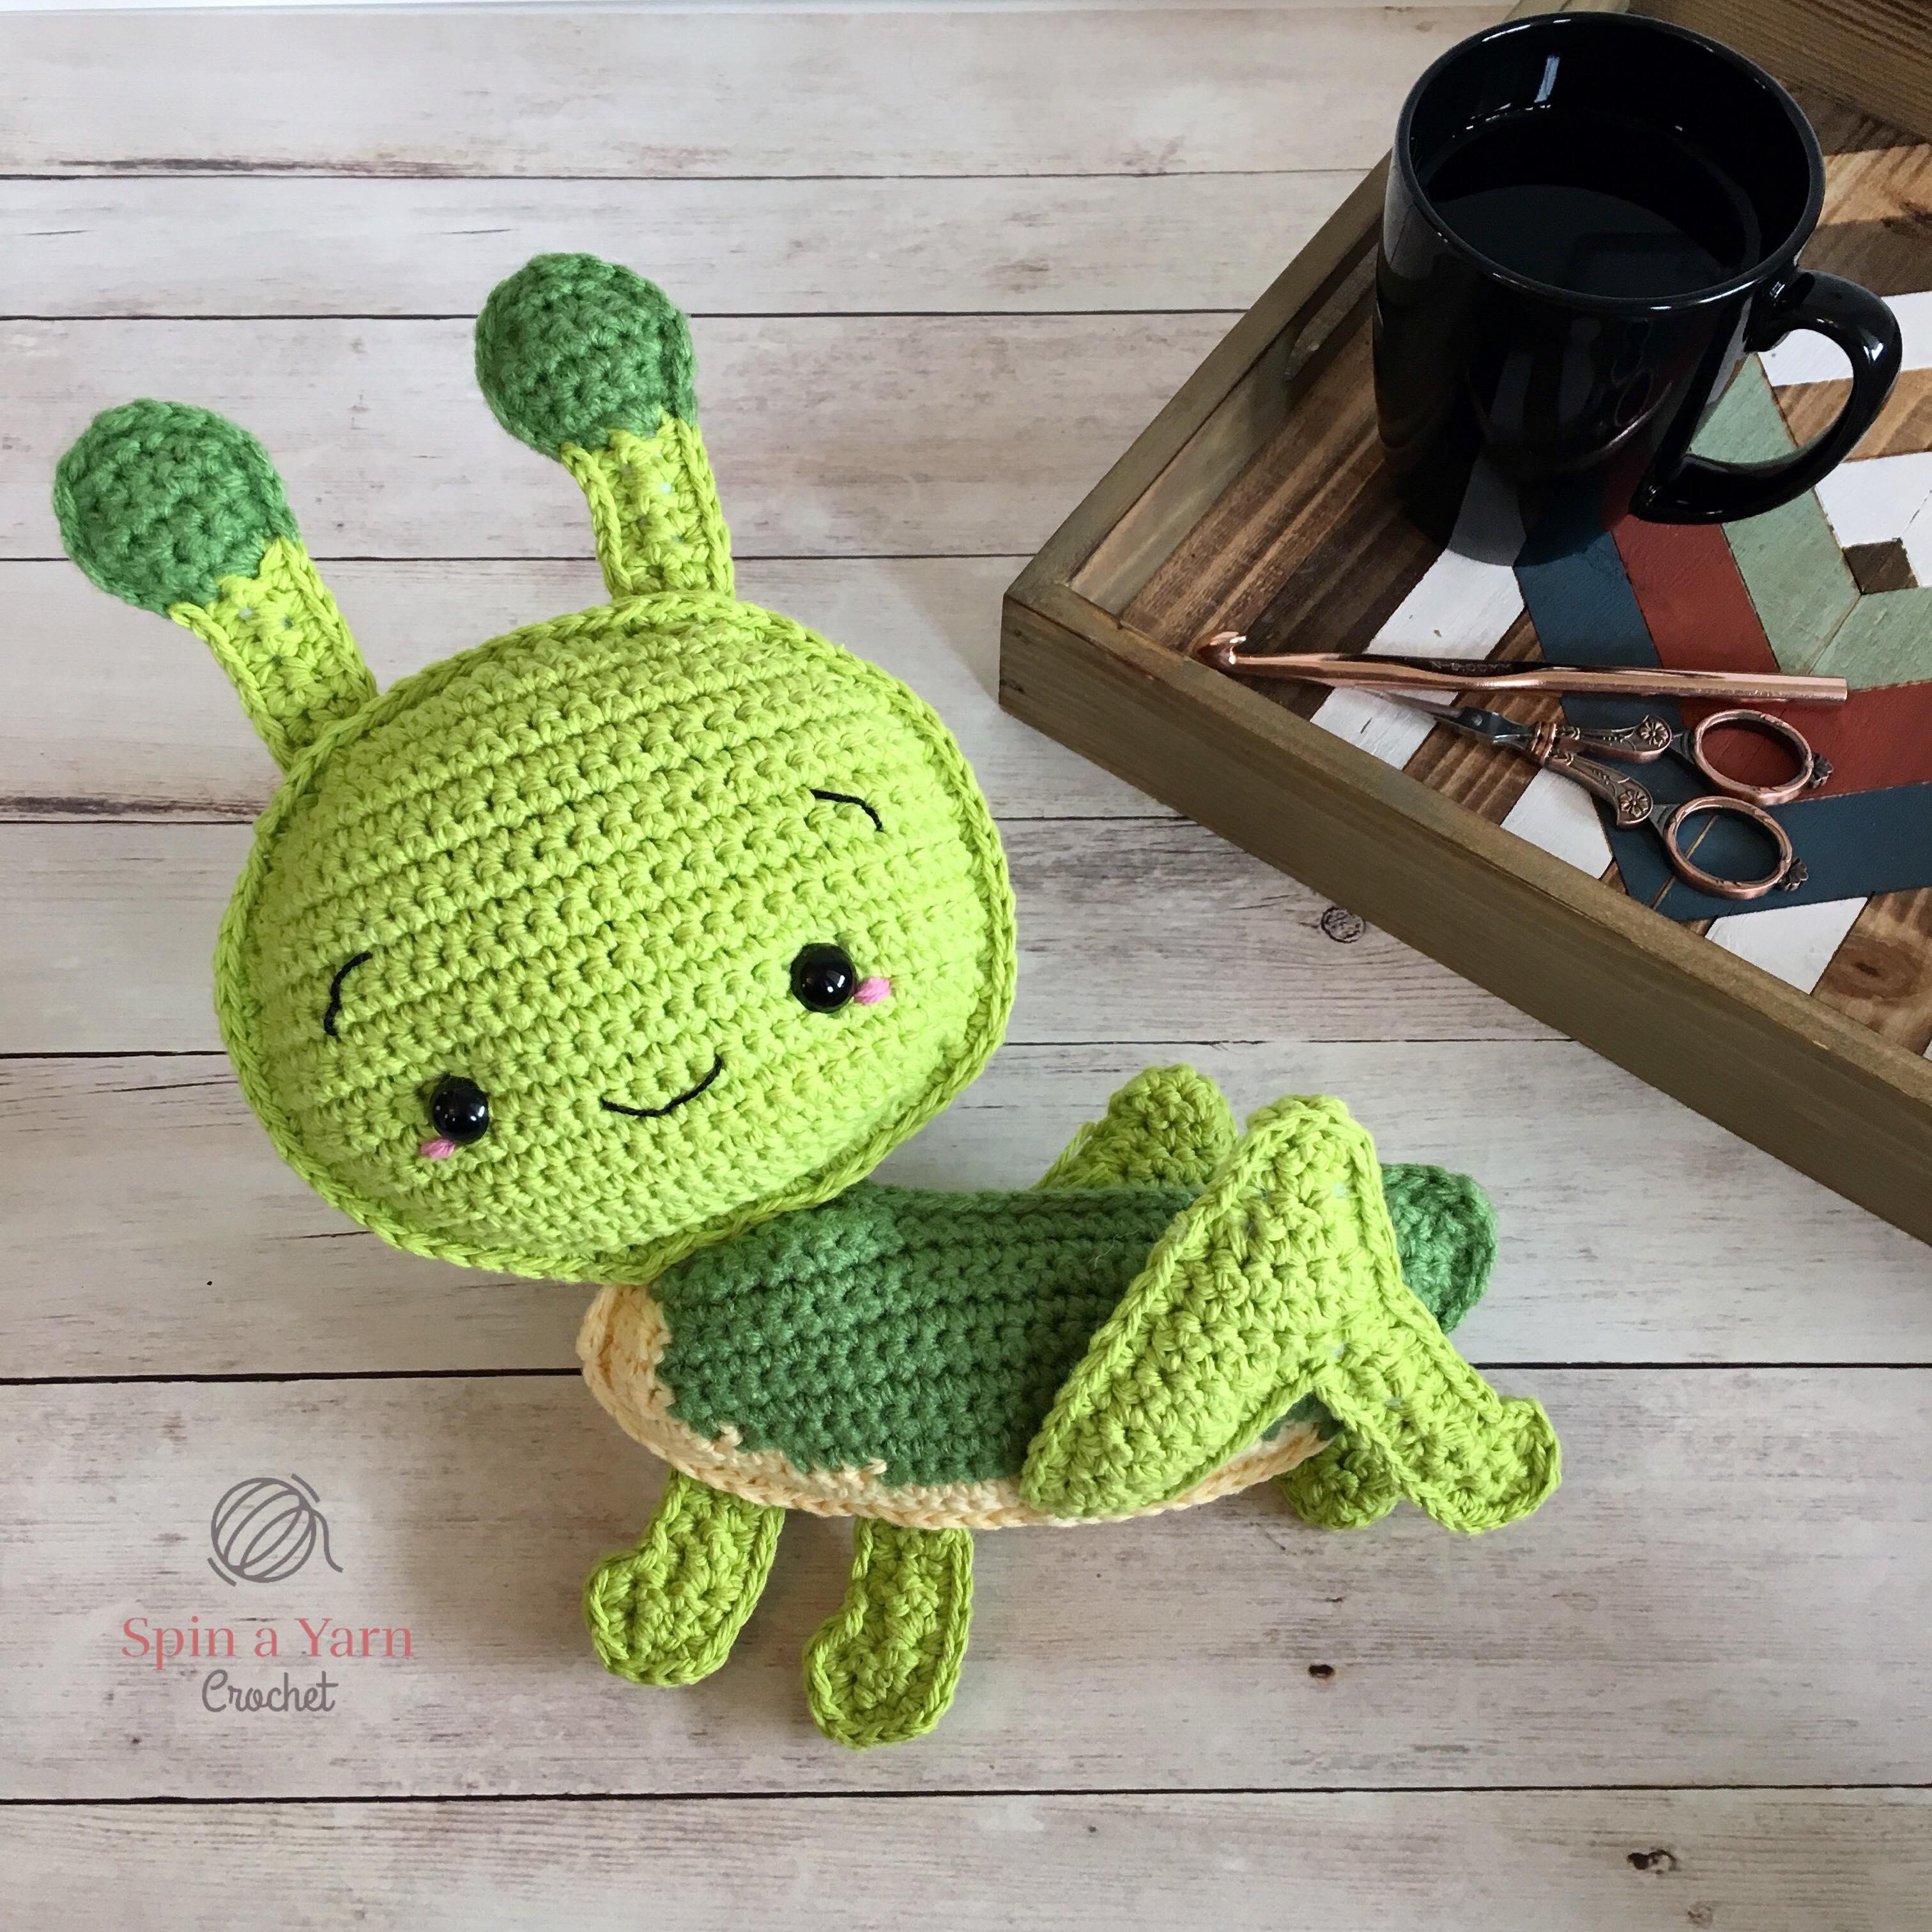 Grasshopper Amigurumi Free Crochet Pattern Spin A Yarn Crochet